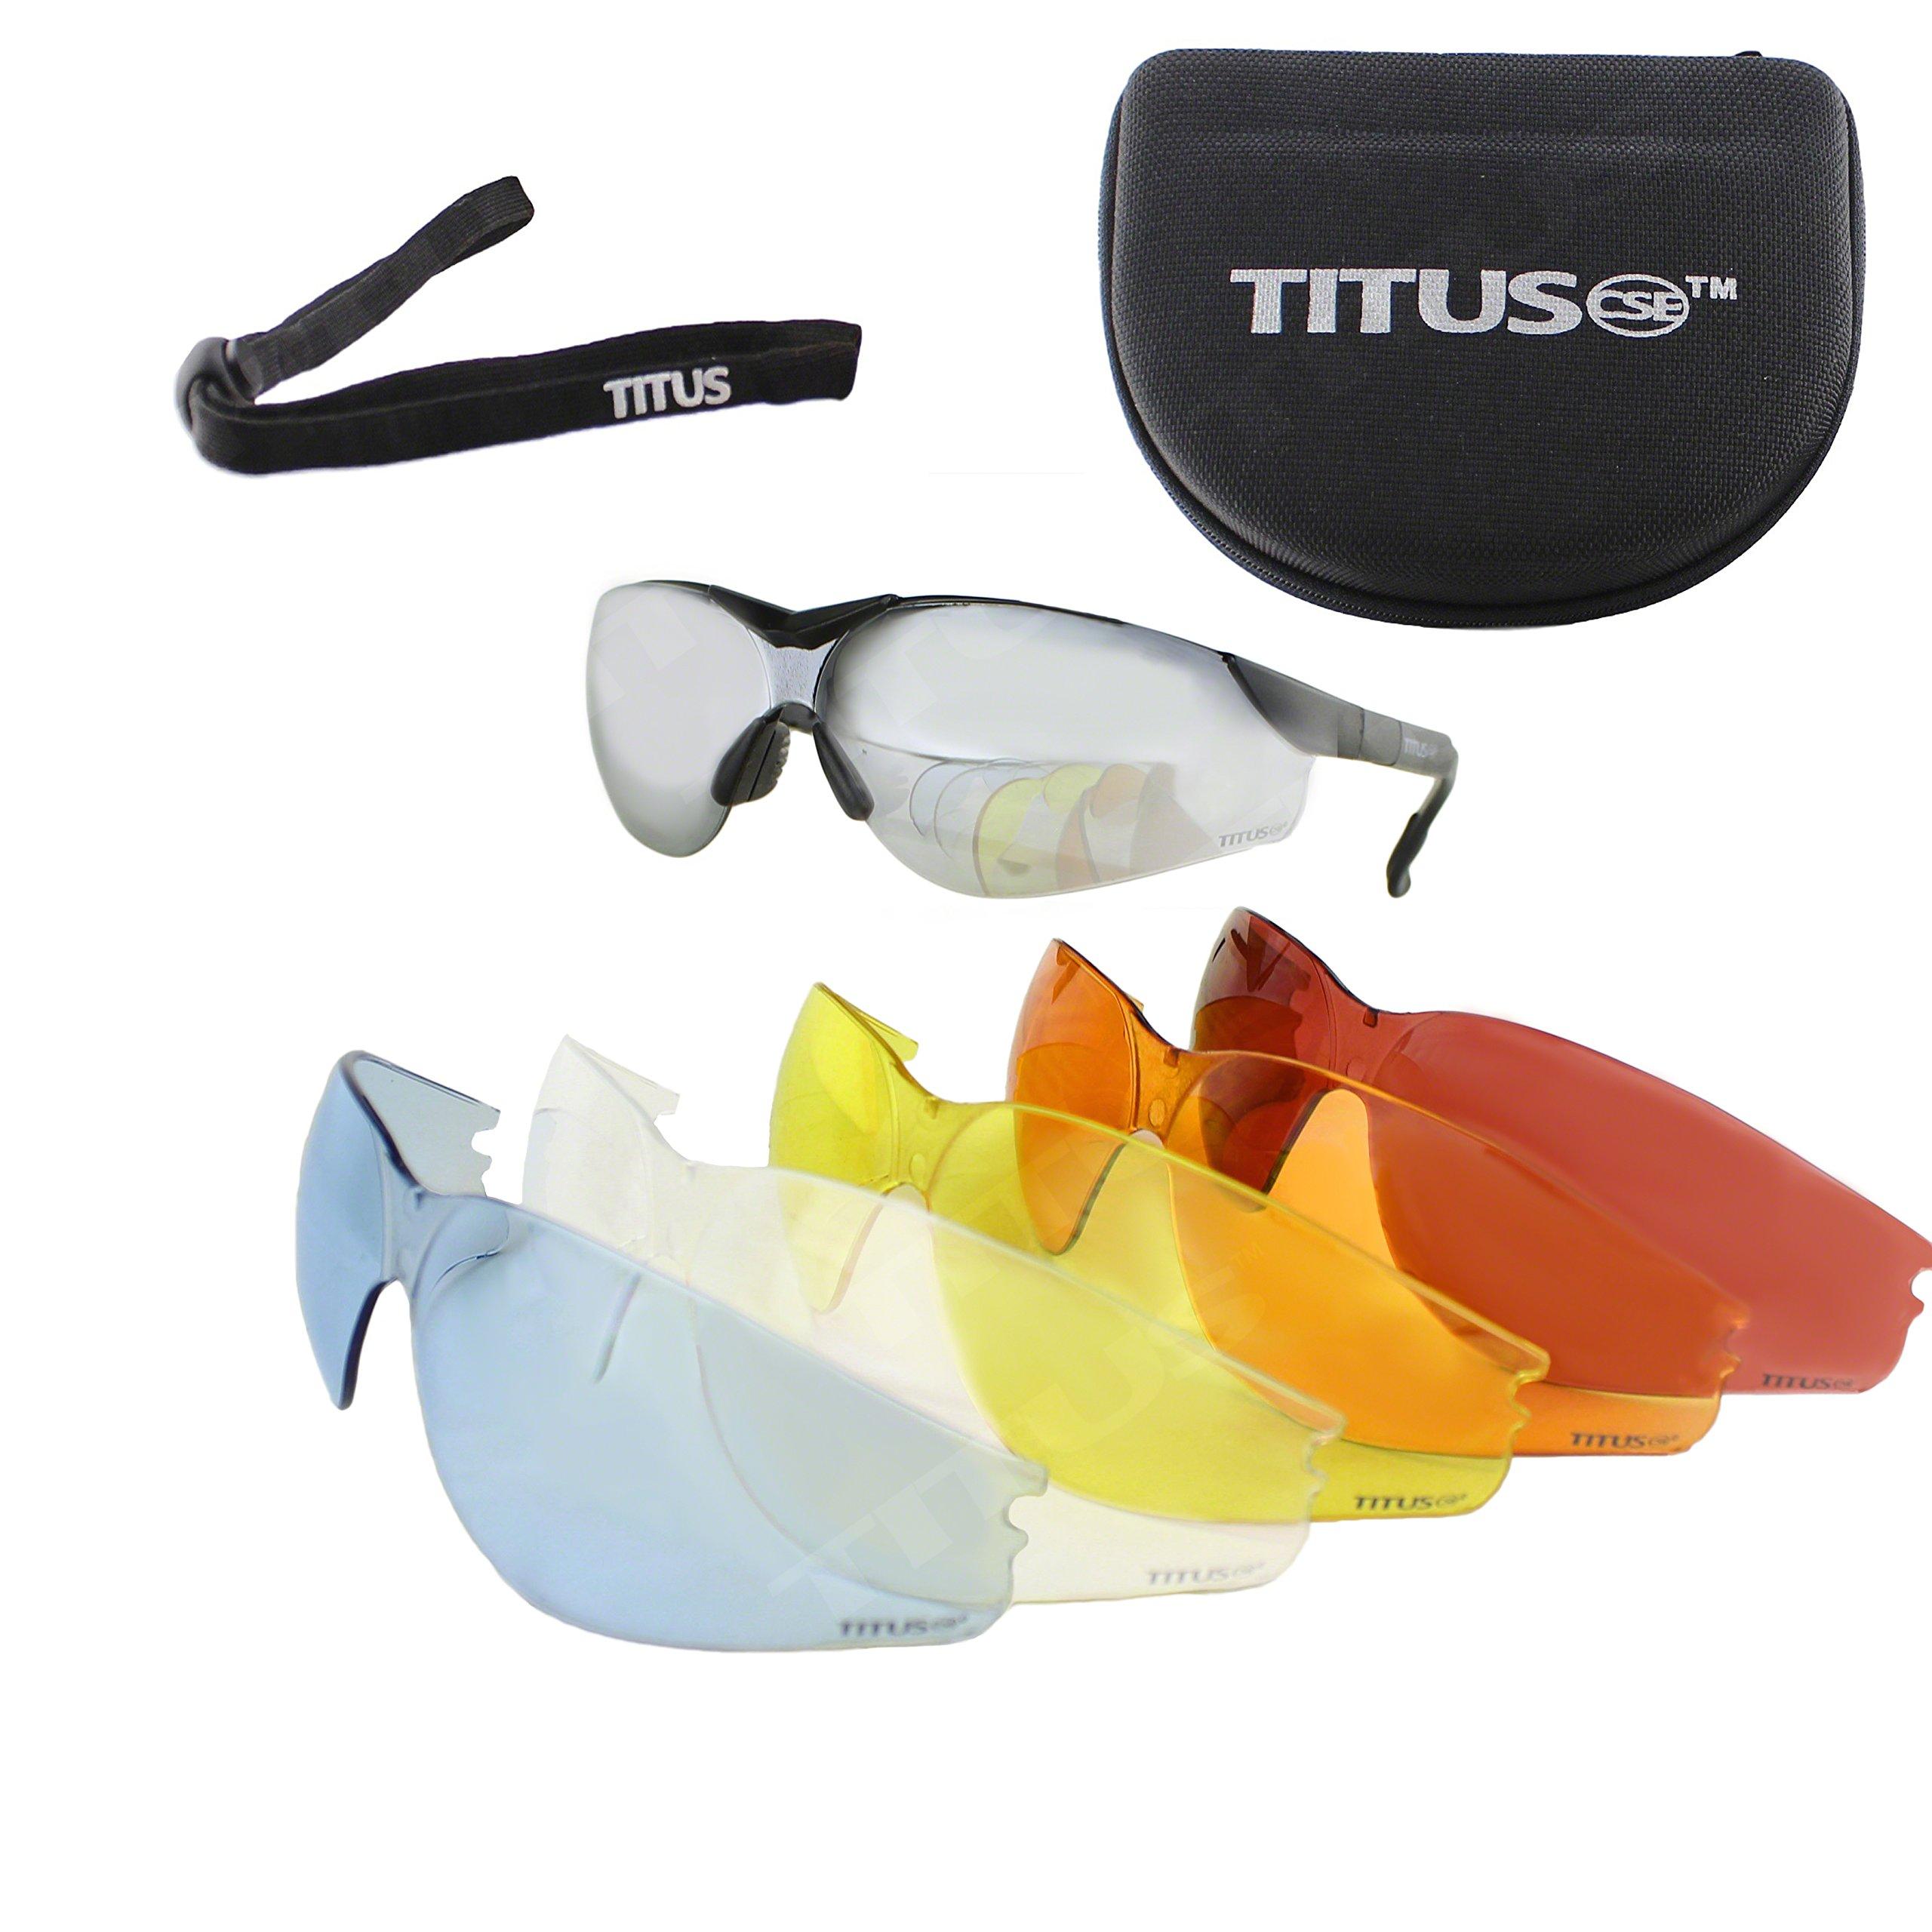 Titus Premium G Series Multi-Lens Safety Glasses Bundle - Professional Range Glasses, 9 Piece Kit by Titus